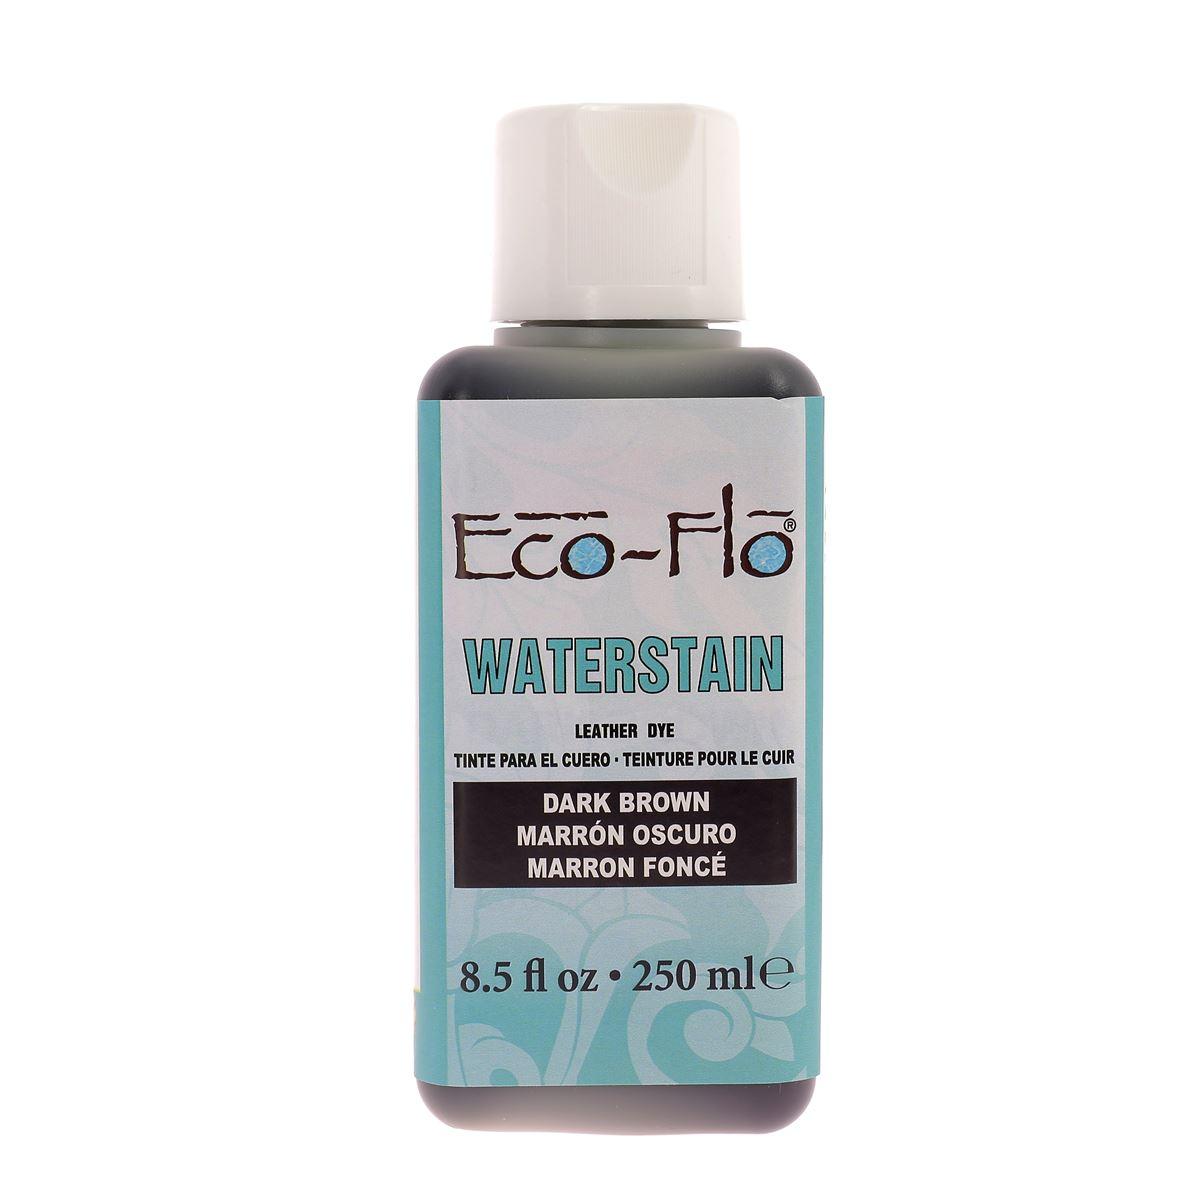 Teinture ECO-FLO WATERSTAIN - CHOCOLAT / DARK BROWN - 250 ml